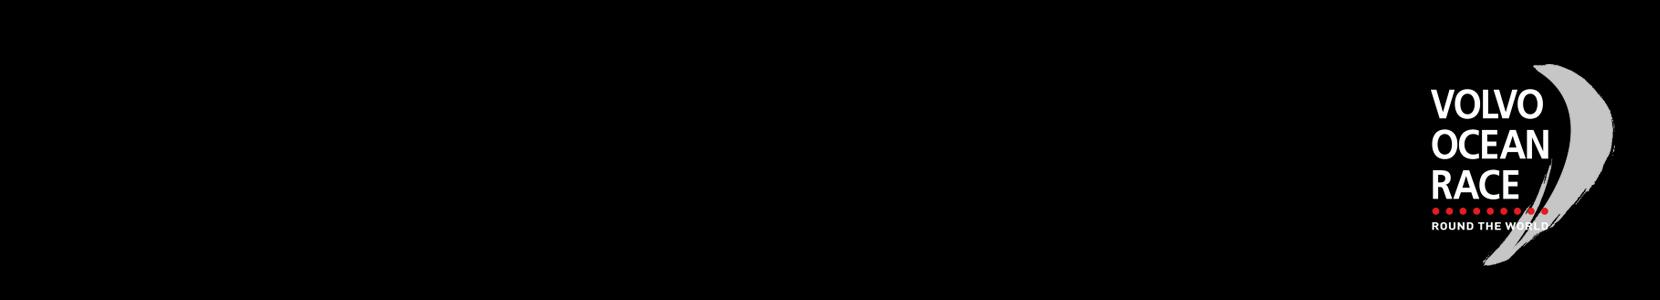 footer-strip